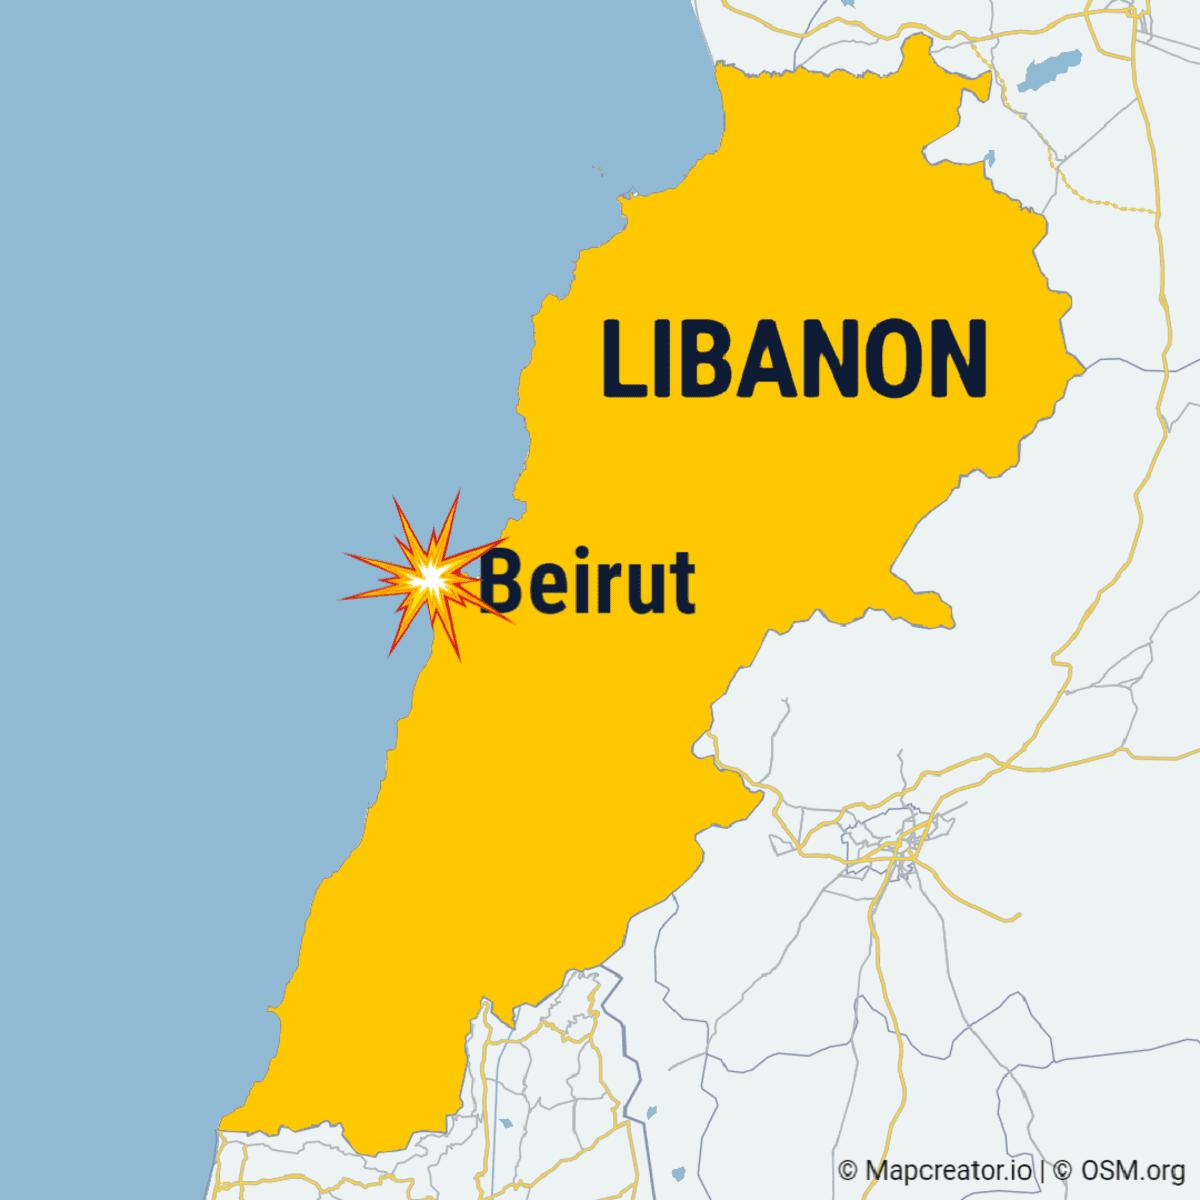 Beirut kartalla.